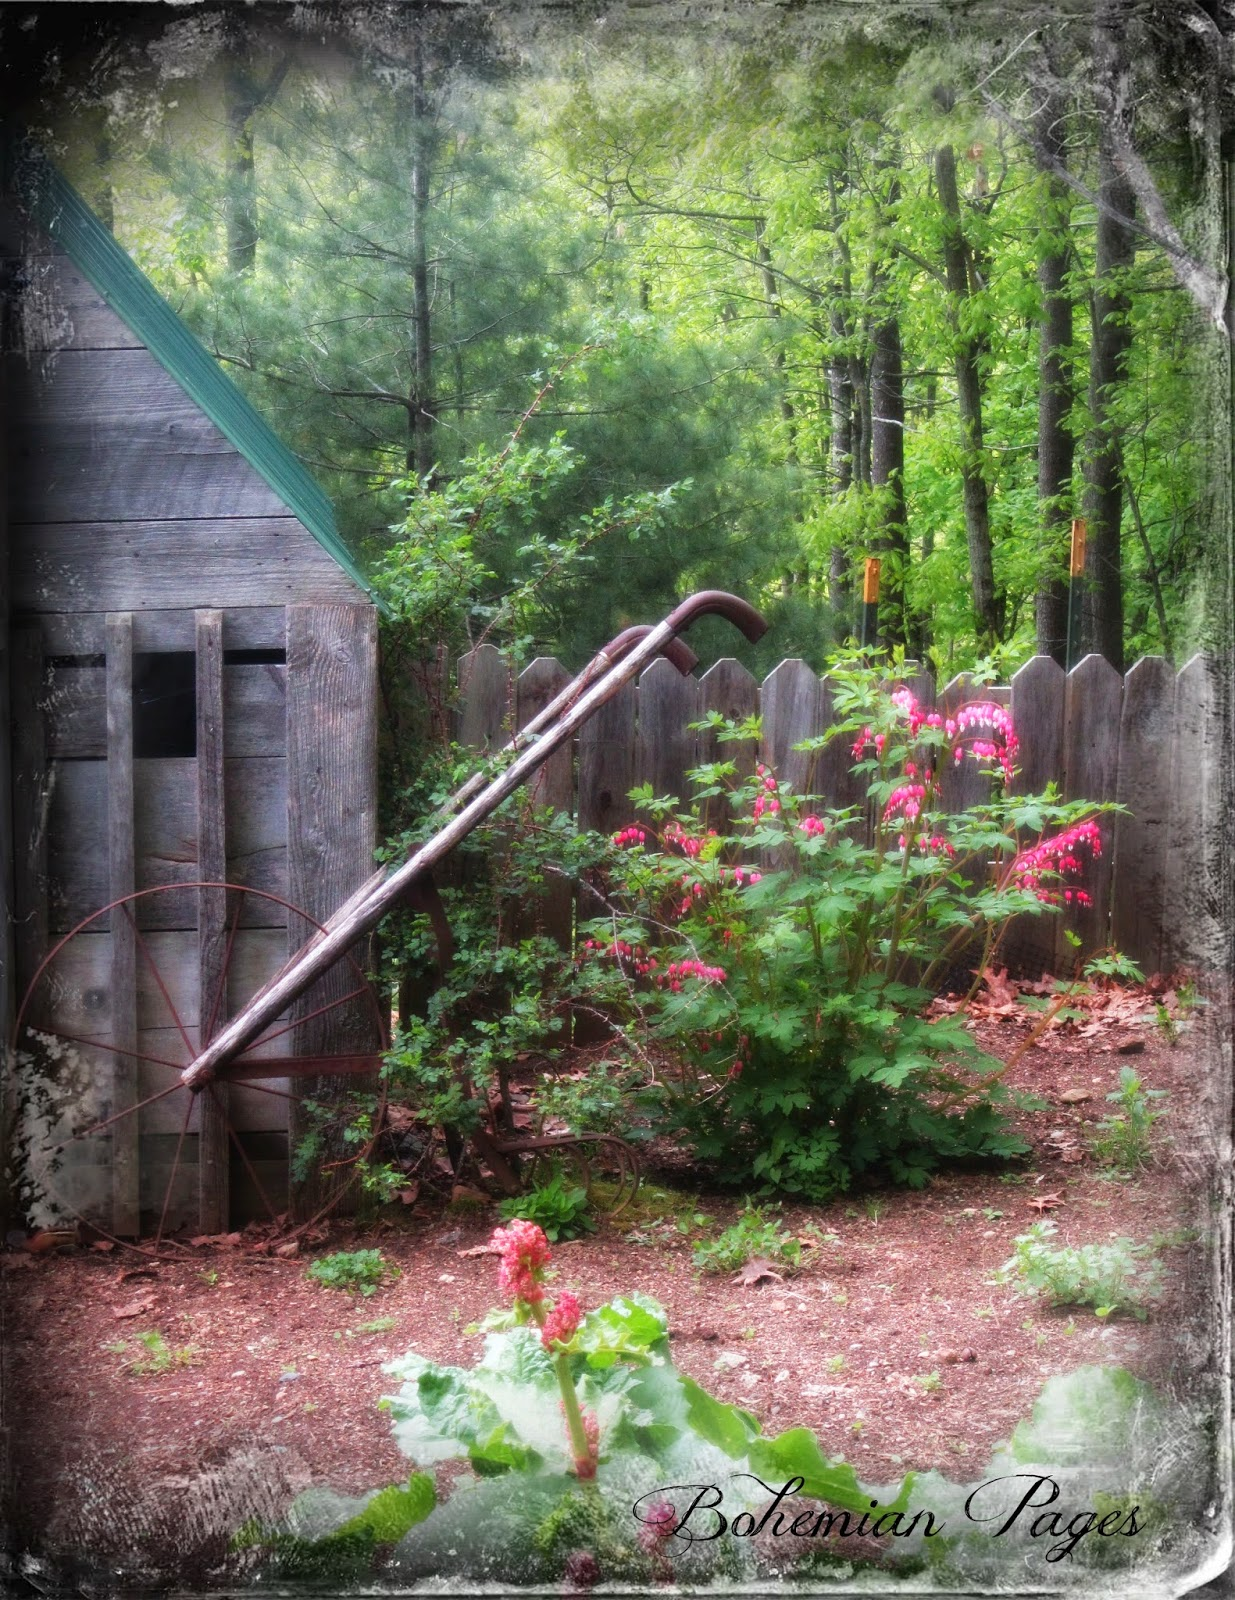 Bohemian Path Tarot: Bohemian Pages